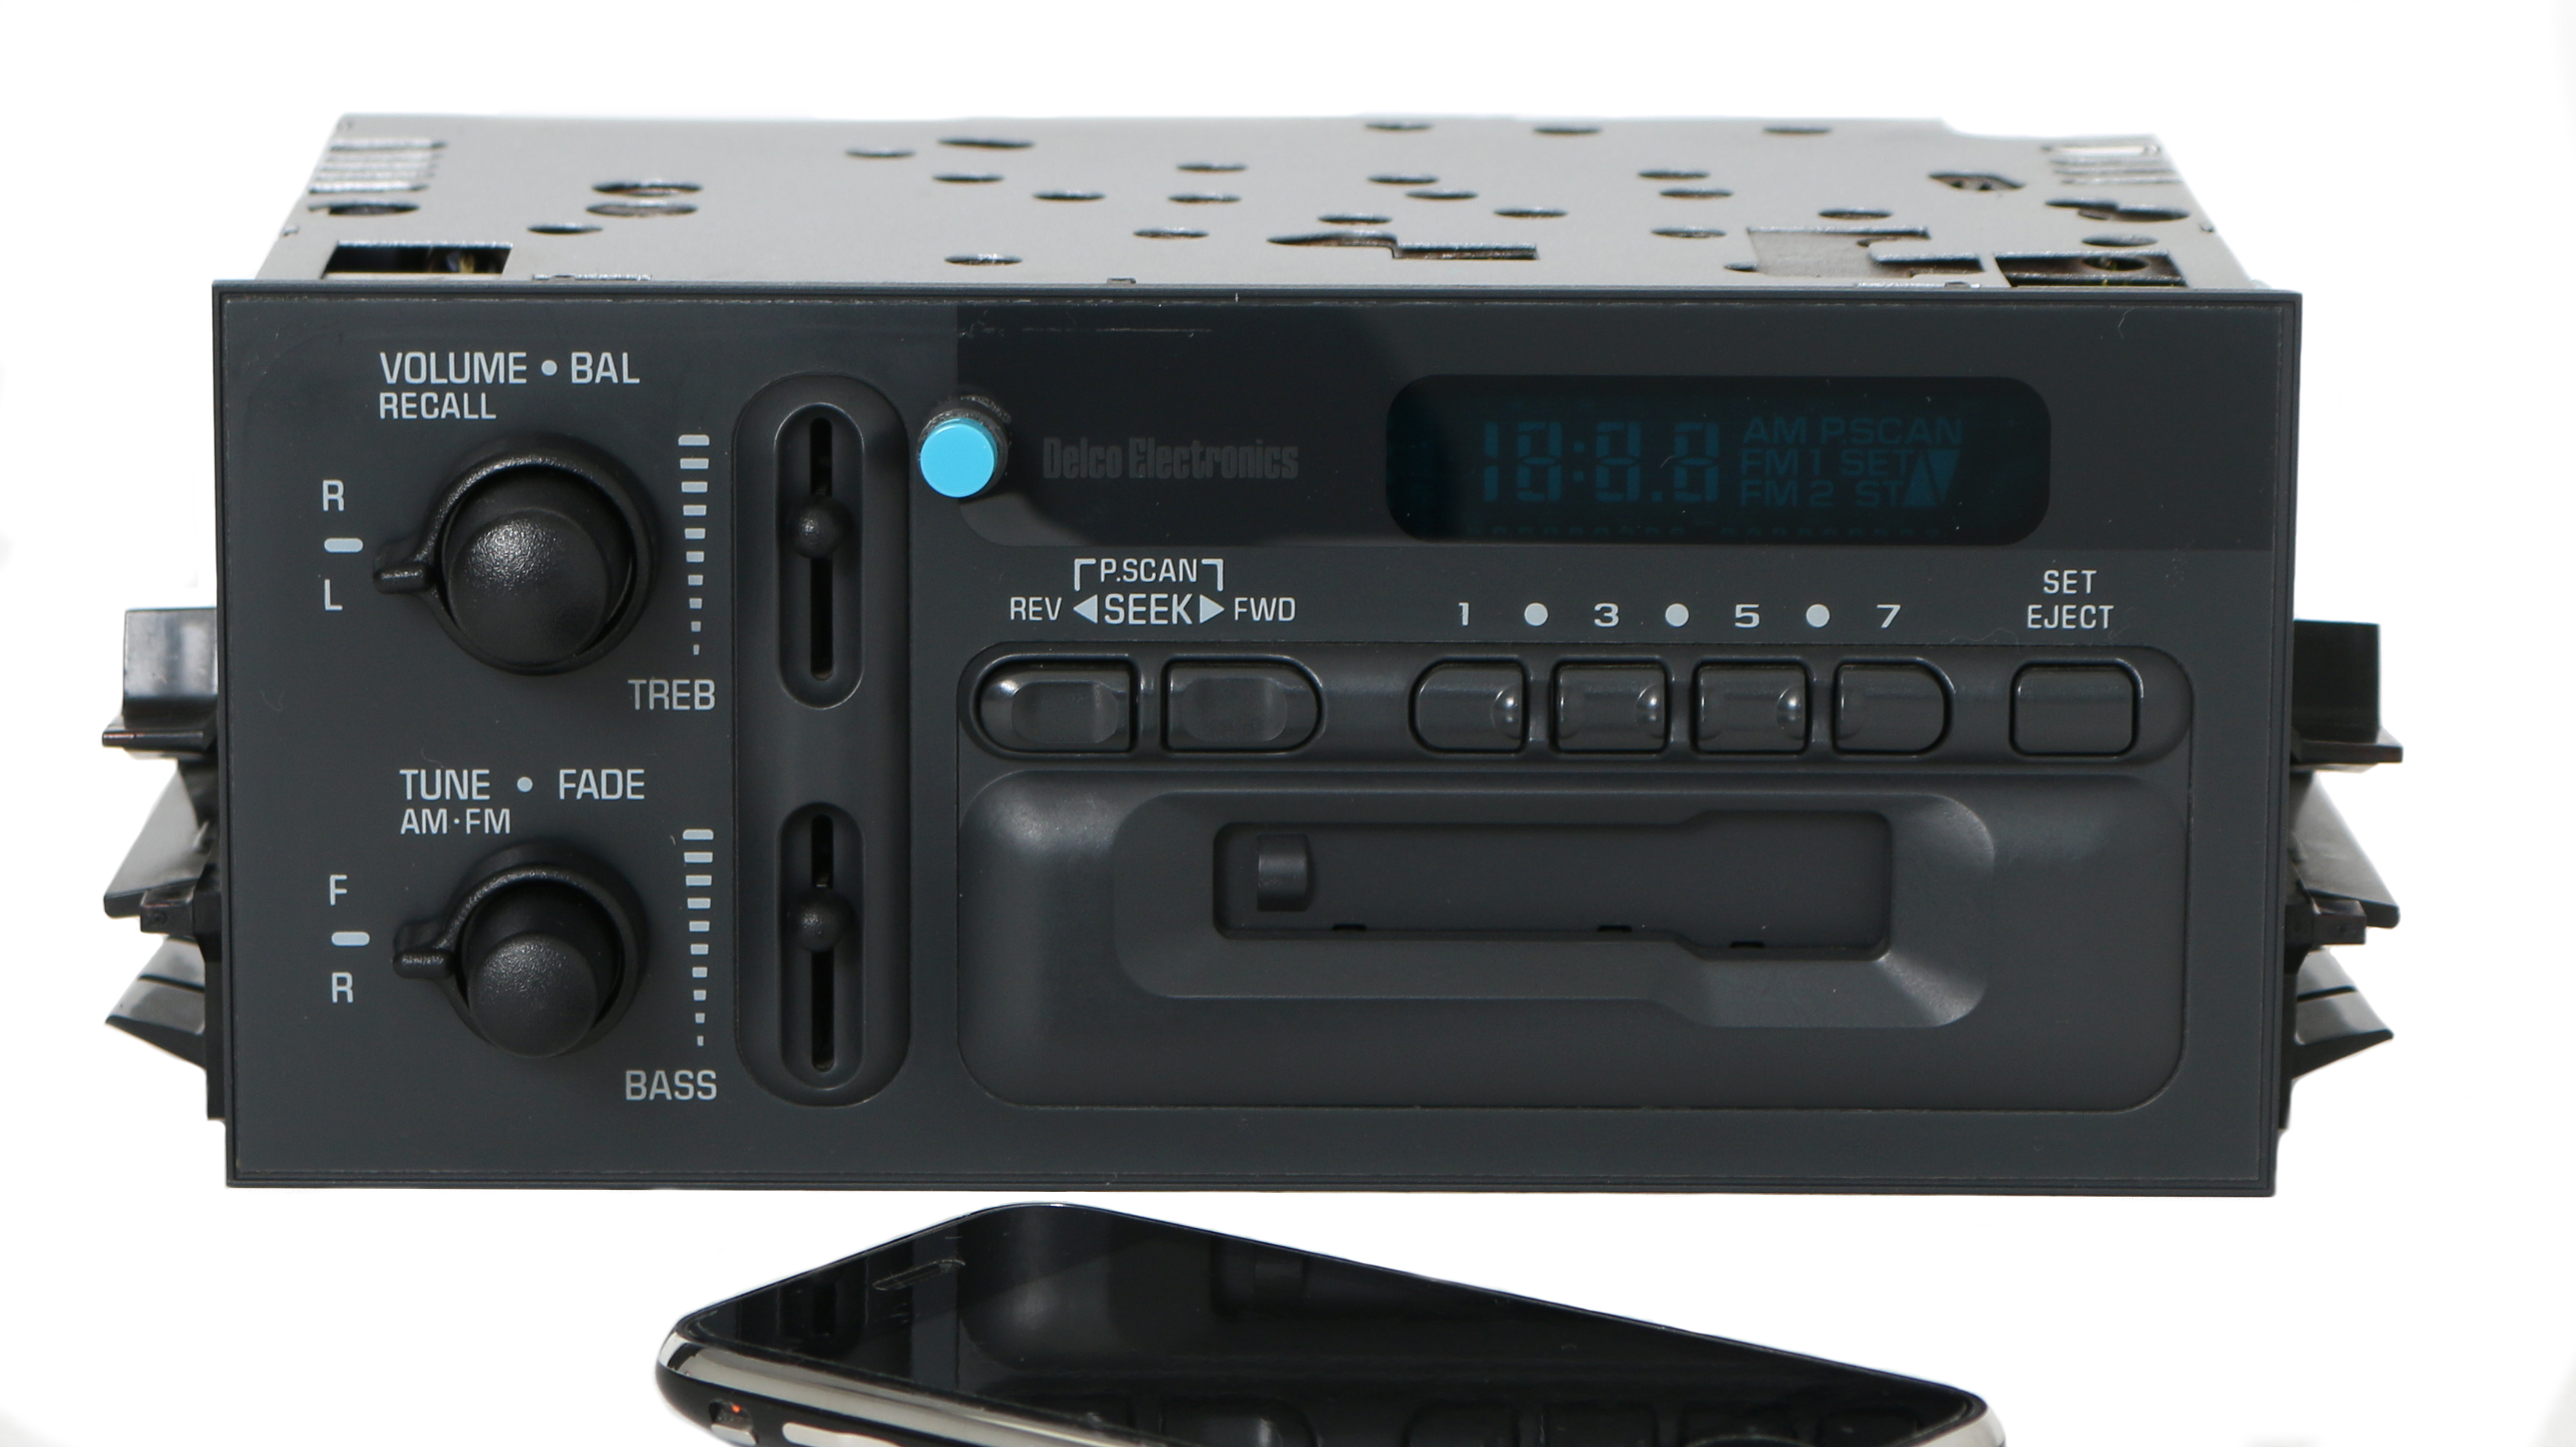 Chevy GMC 95-02 Truck Van Radio AM FM Cassette Player w Bluetooth Music 16180215 Refurbished by GM